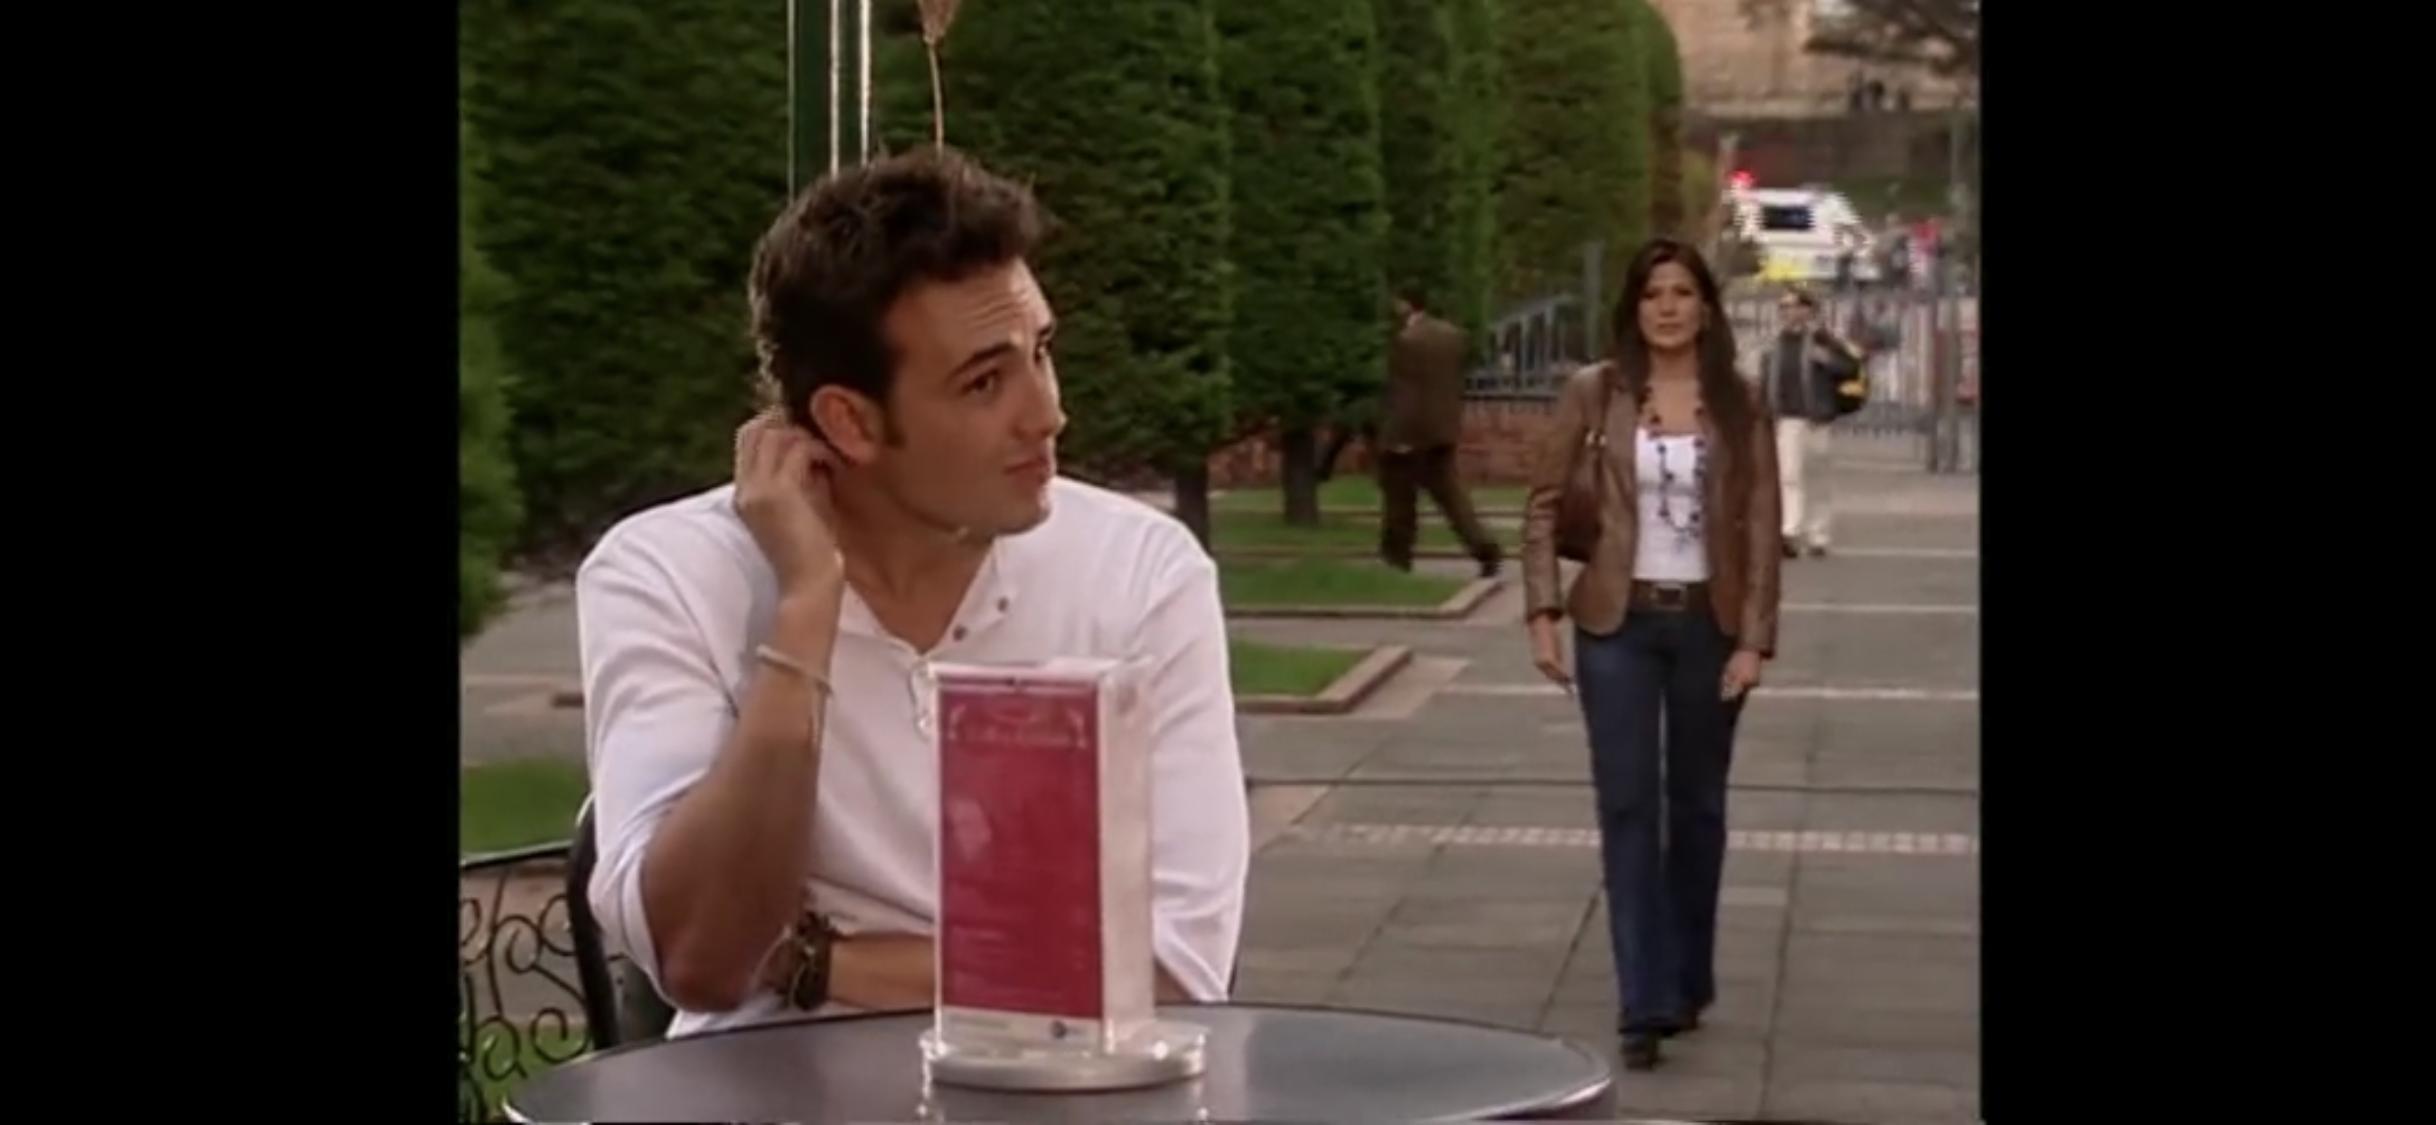 Kathy Sáenz and Sebastian Martínez in Juegos prohibidos (2005)